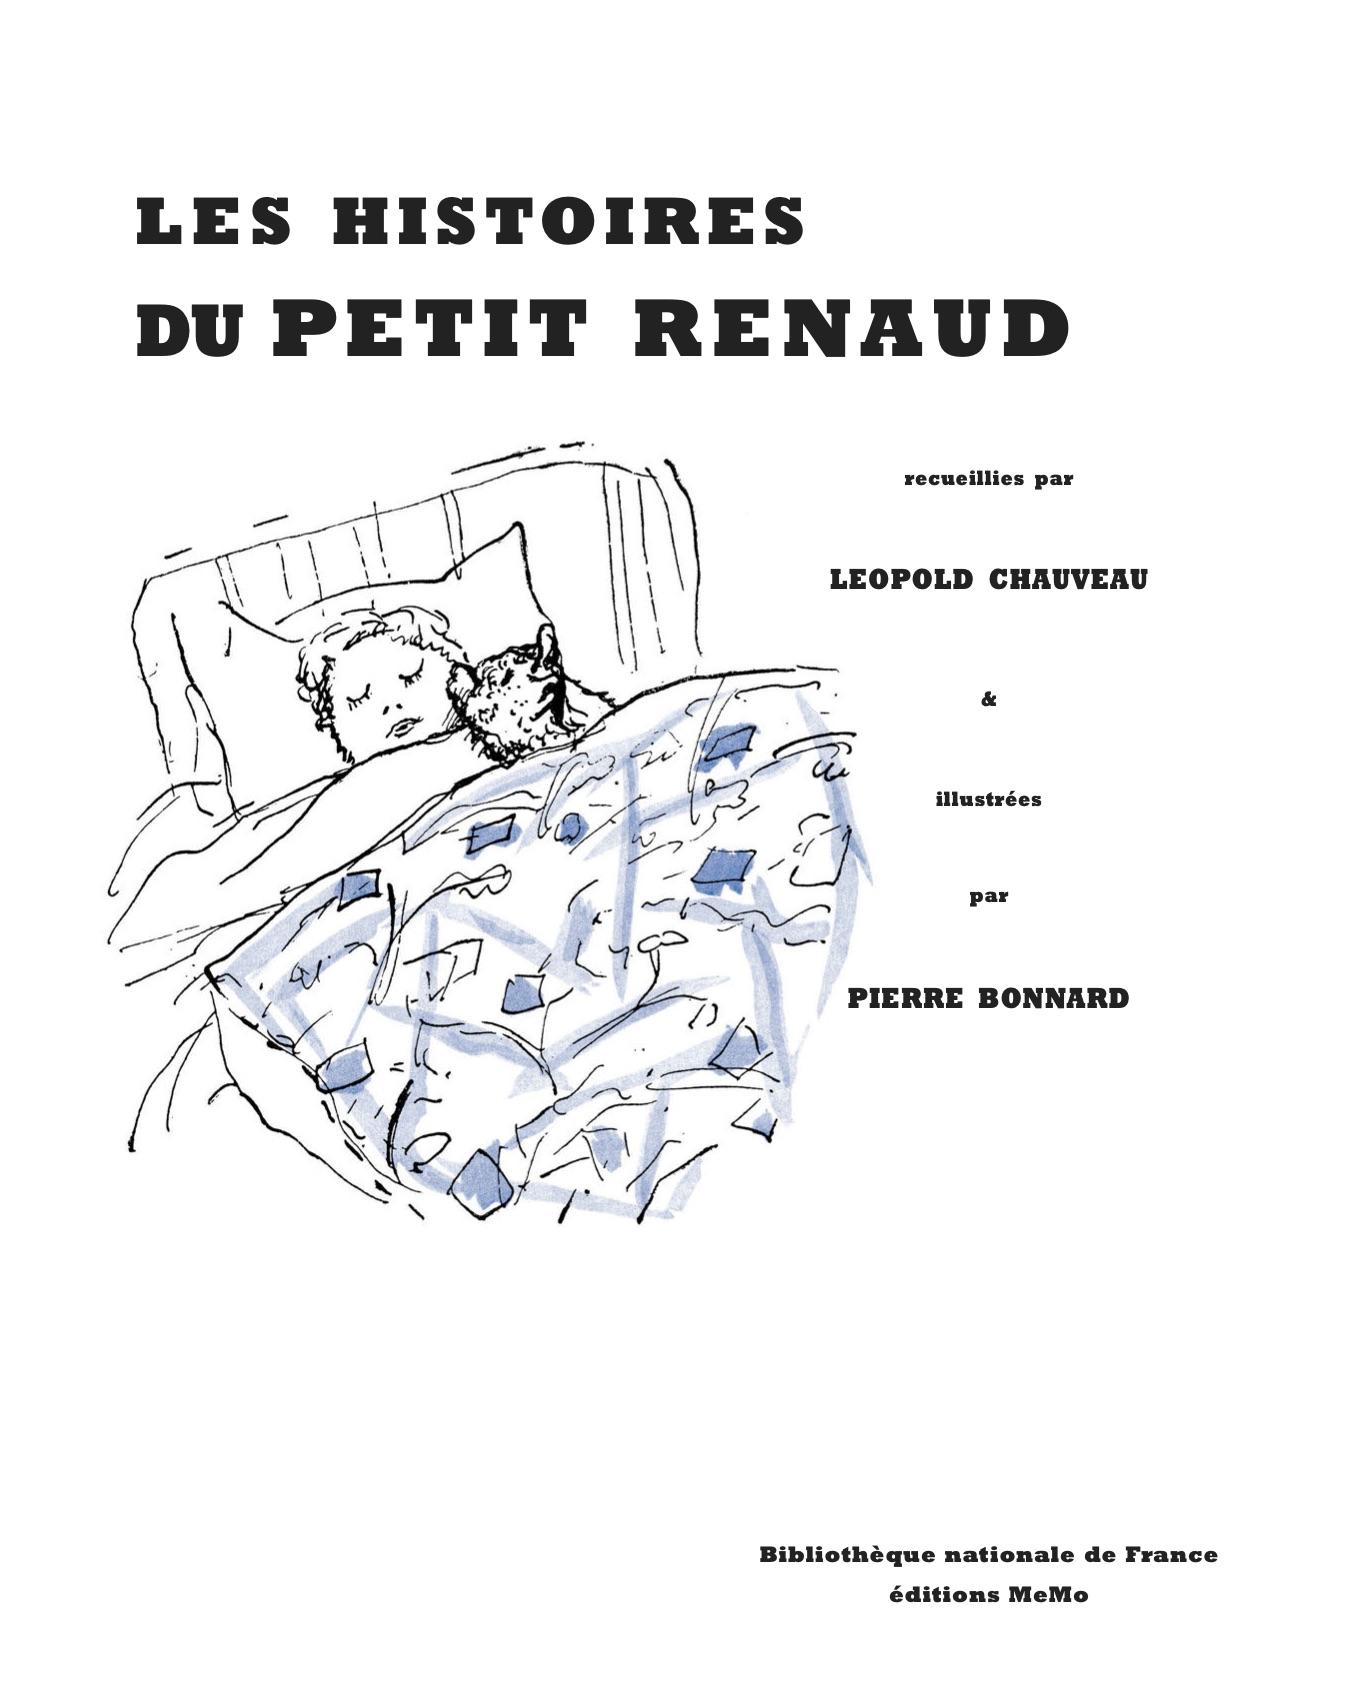 les_histoires_du_petit_renaud.jpg